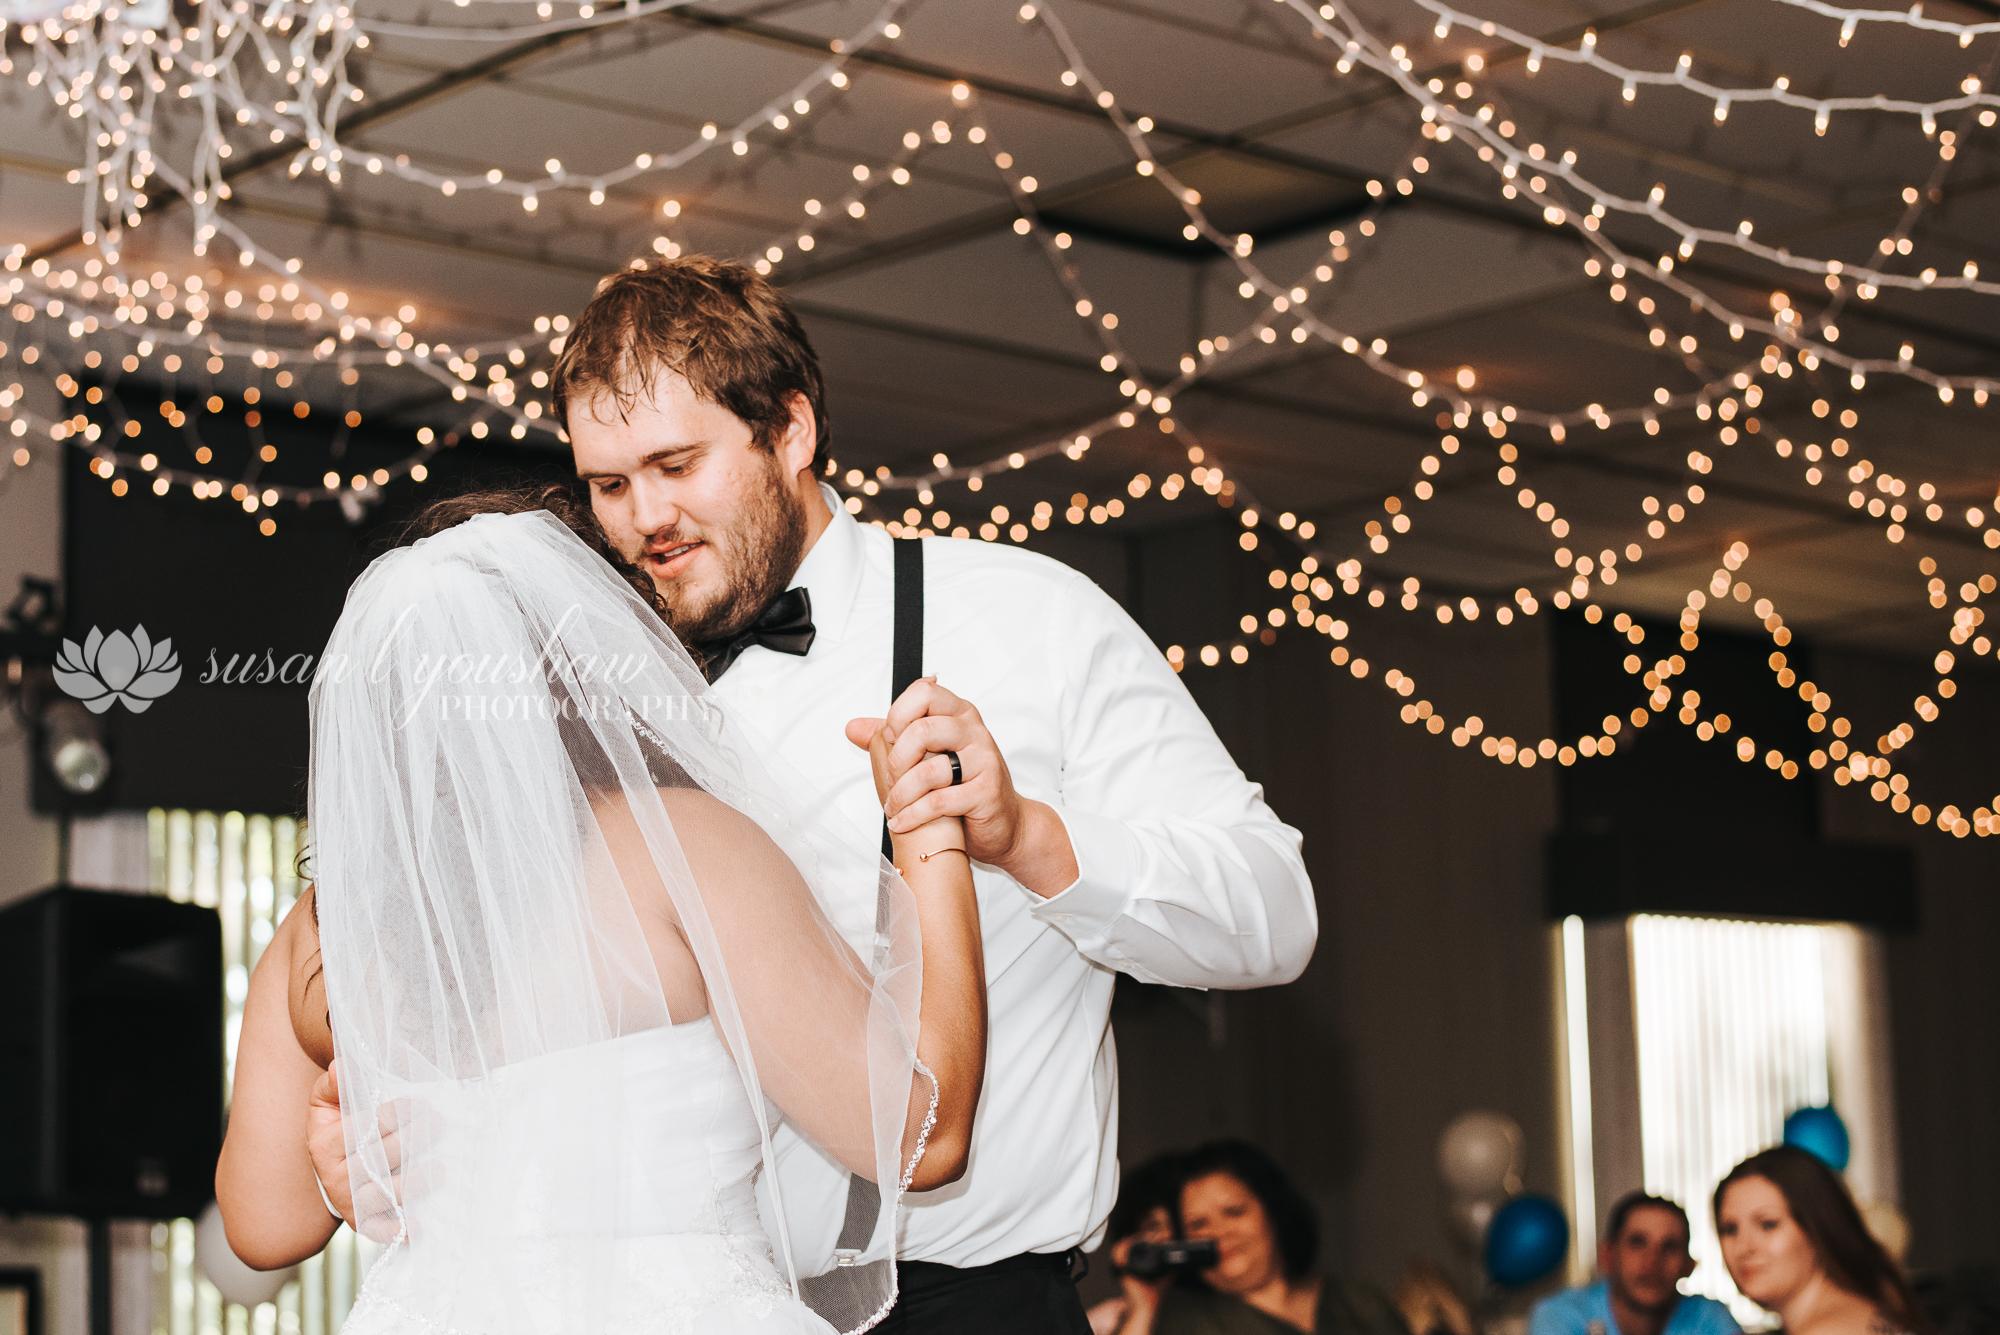 Katelyn and Wes Wedding Photos 07-13-2019 SLY Photography-104.jpg